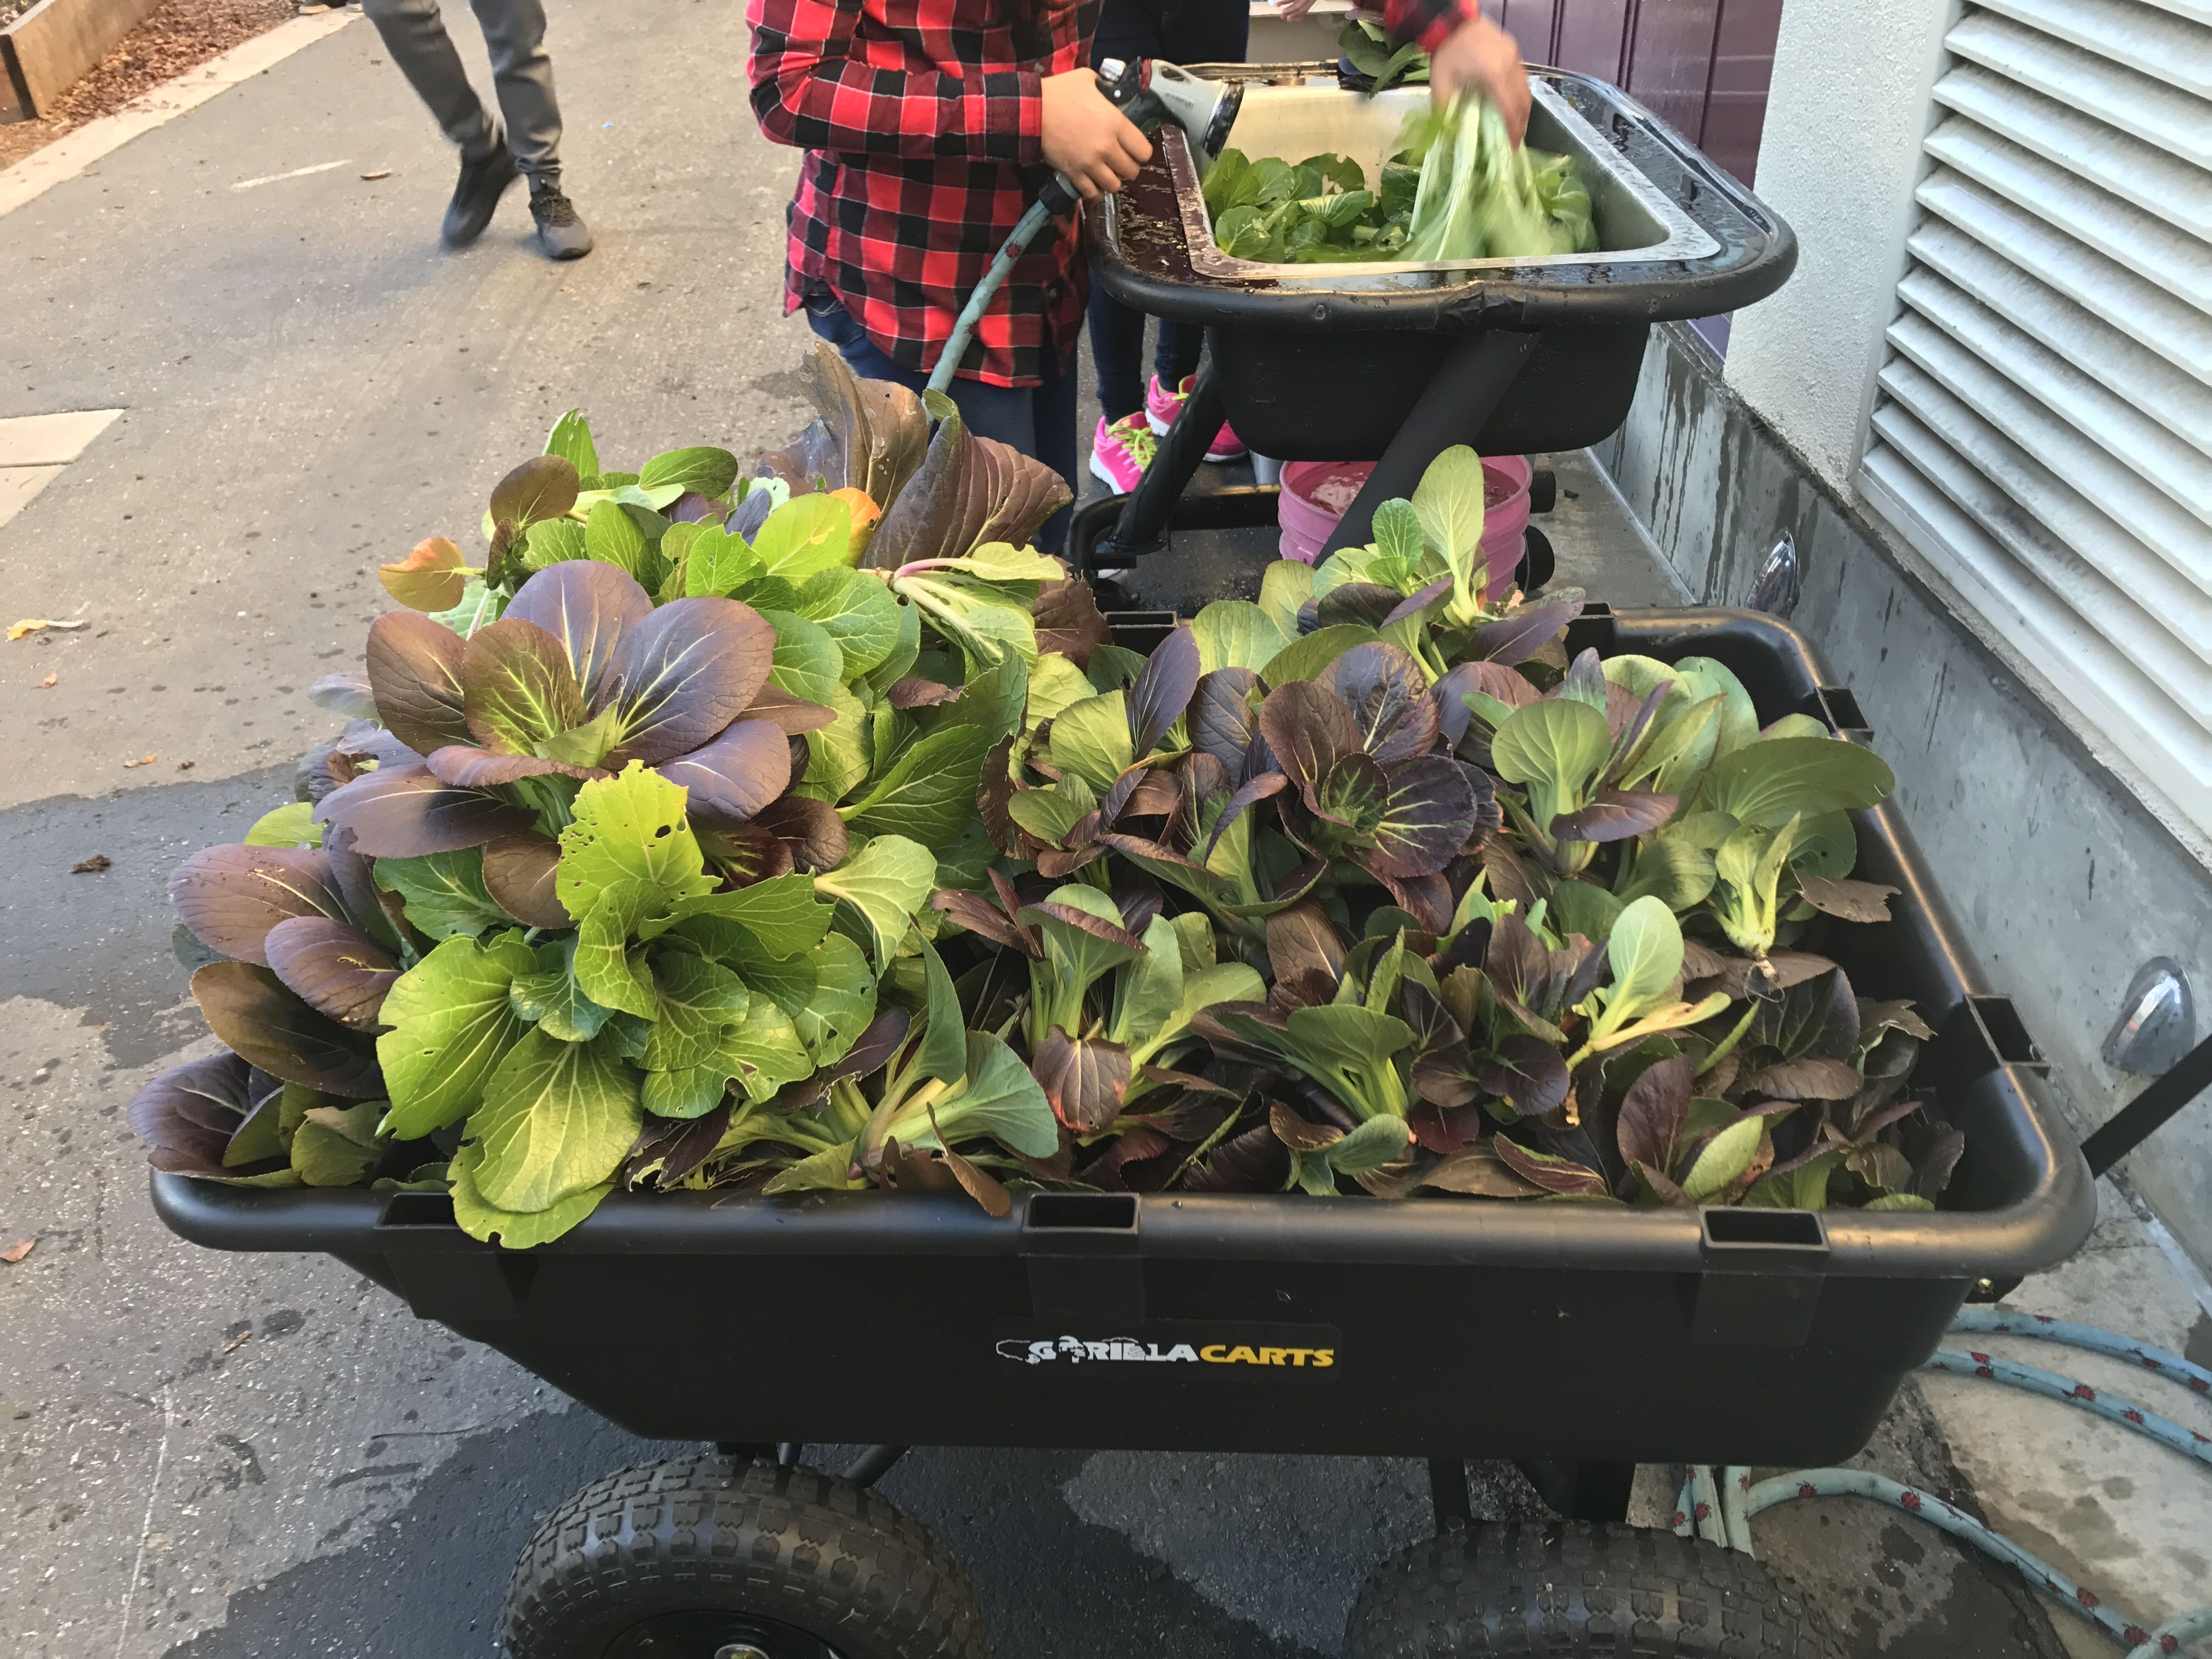 Bok choy harvest gardening for kids plants kids school